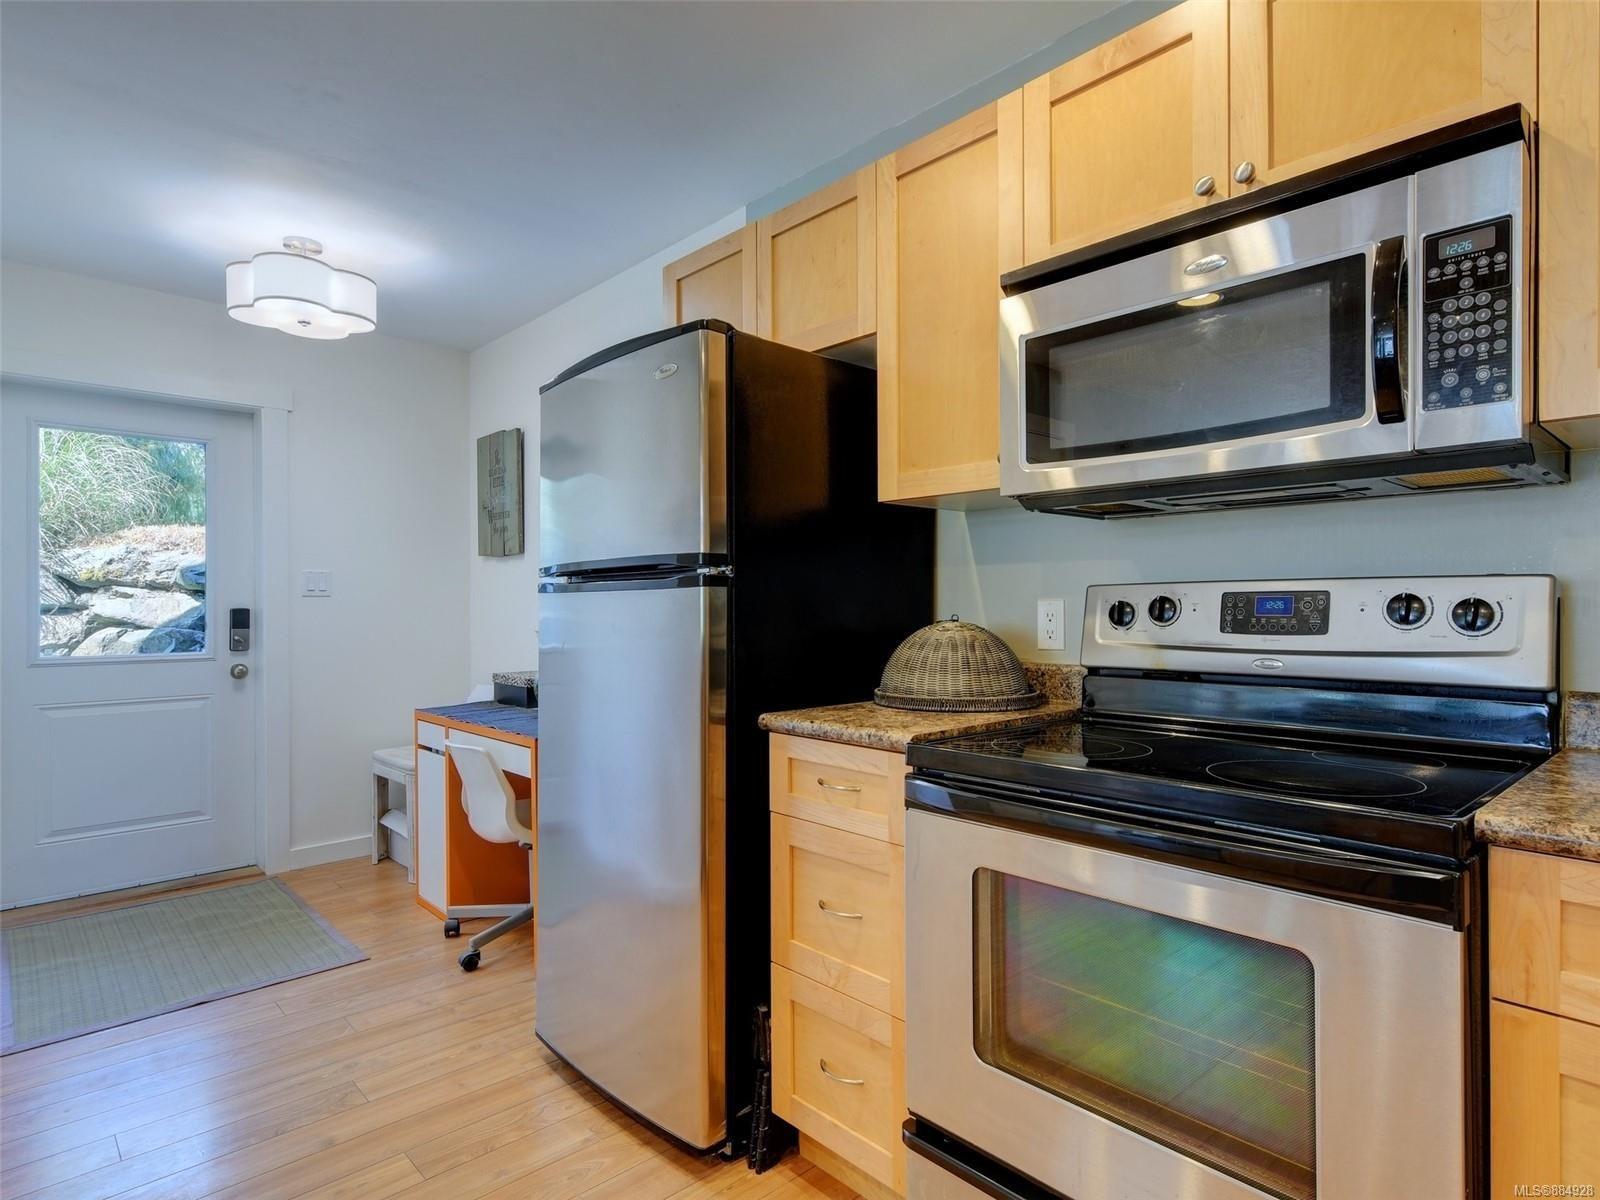 Photo 13: Photos: 6896 Beaton Rd in : Sk Broomhill Half Duplex for sale (Sooke)  : MLS®# 884928